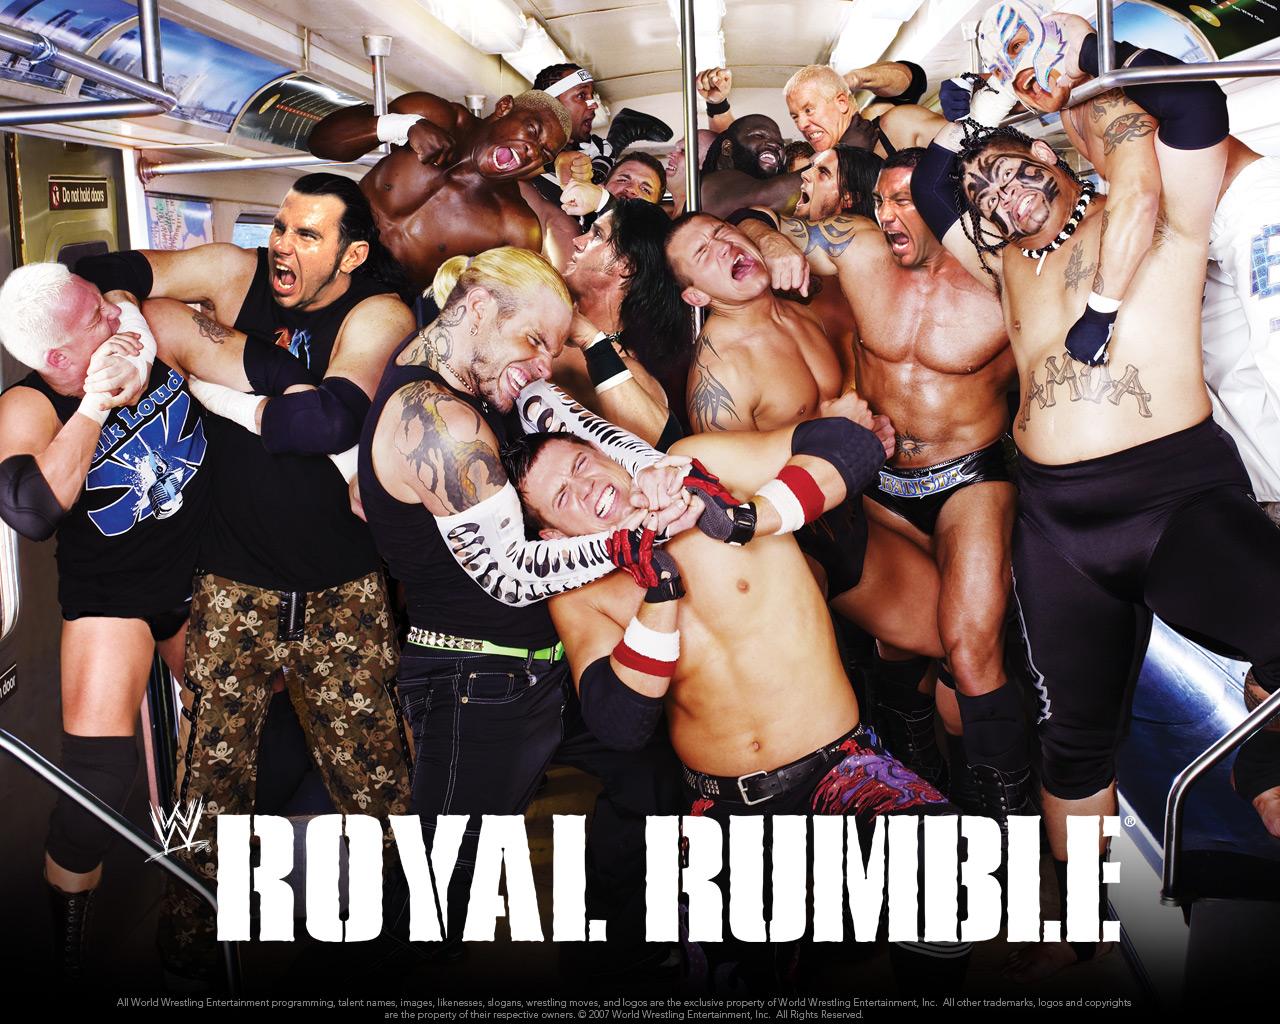 Concurs Rew 2 Wwe-royal-rumble-753590l